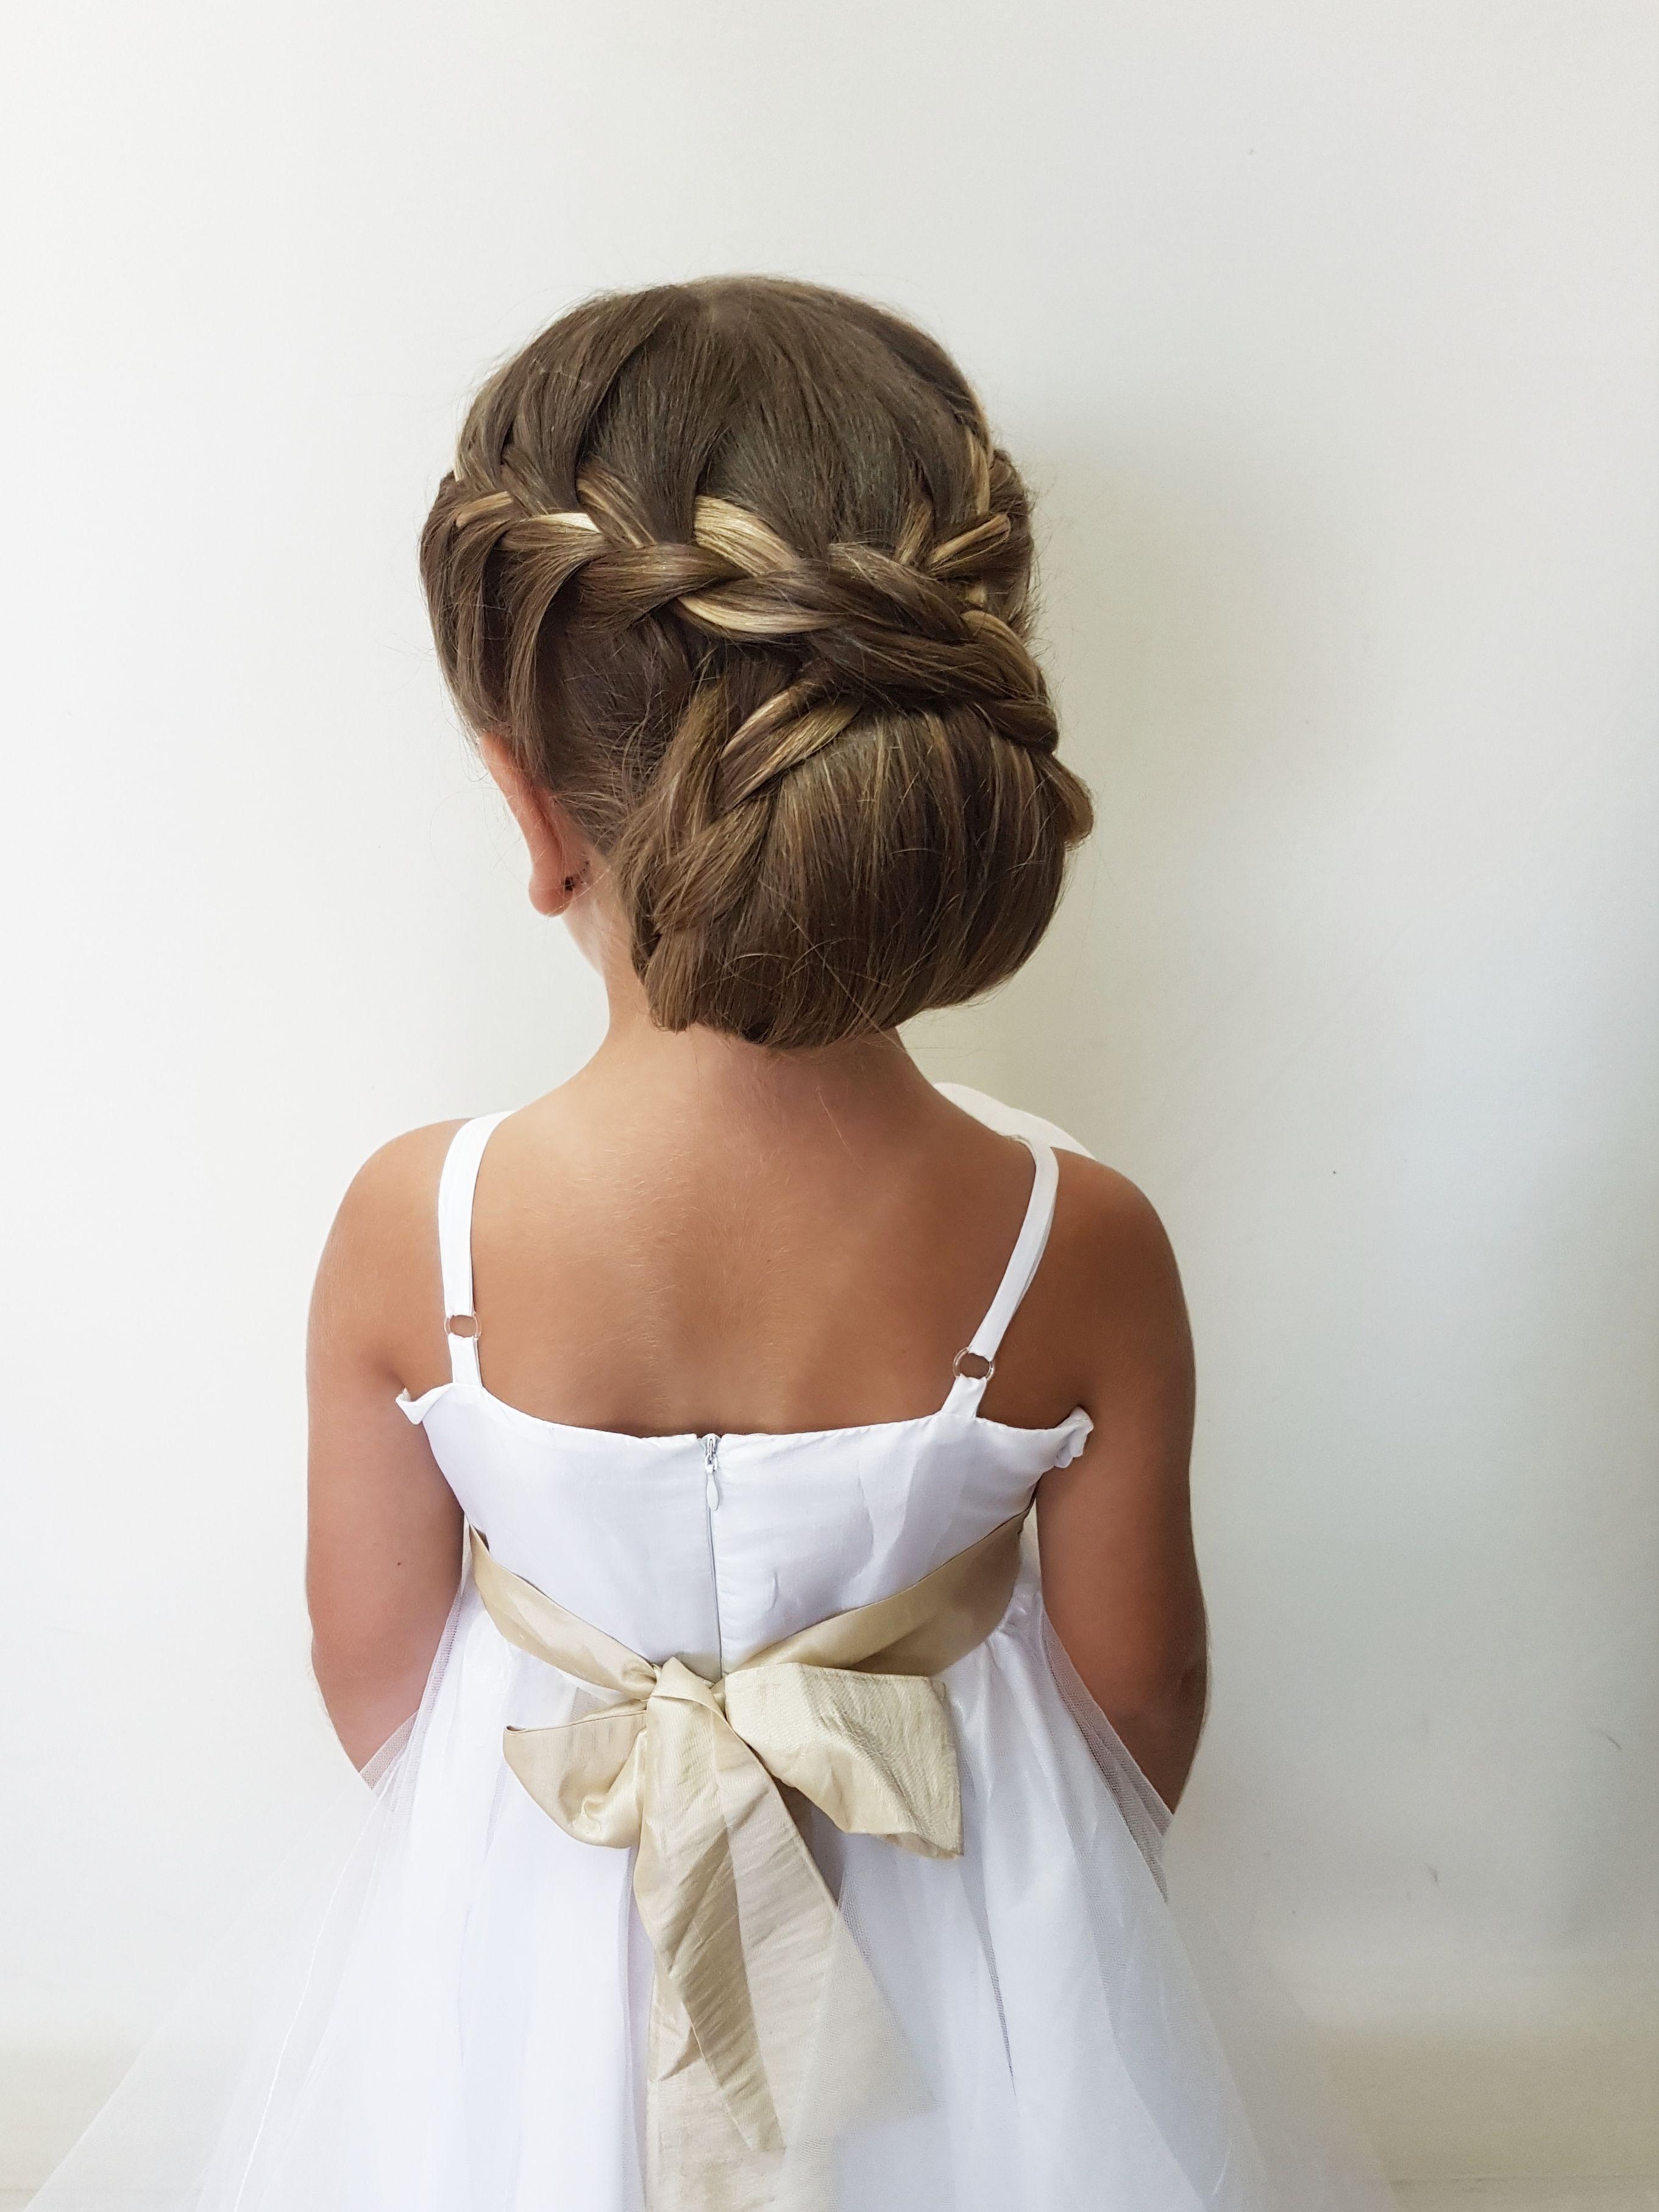 Phenomenal Pin By Christine On Hair Kids Hairstyles For Wedding Schematic Wiring Diagrams Amerangerunnerswayorg